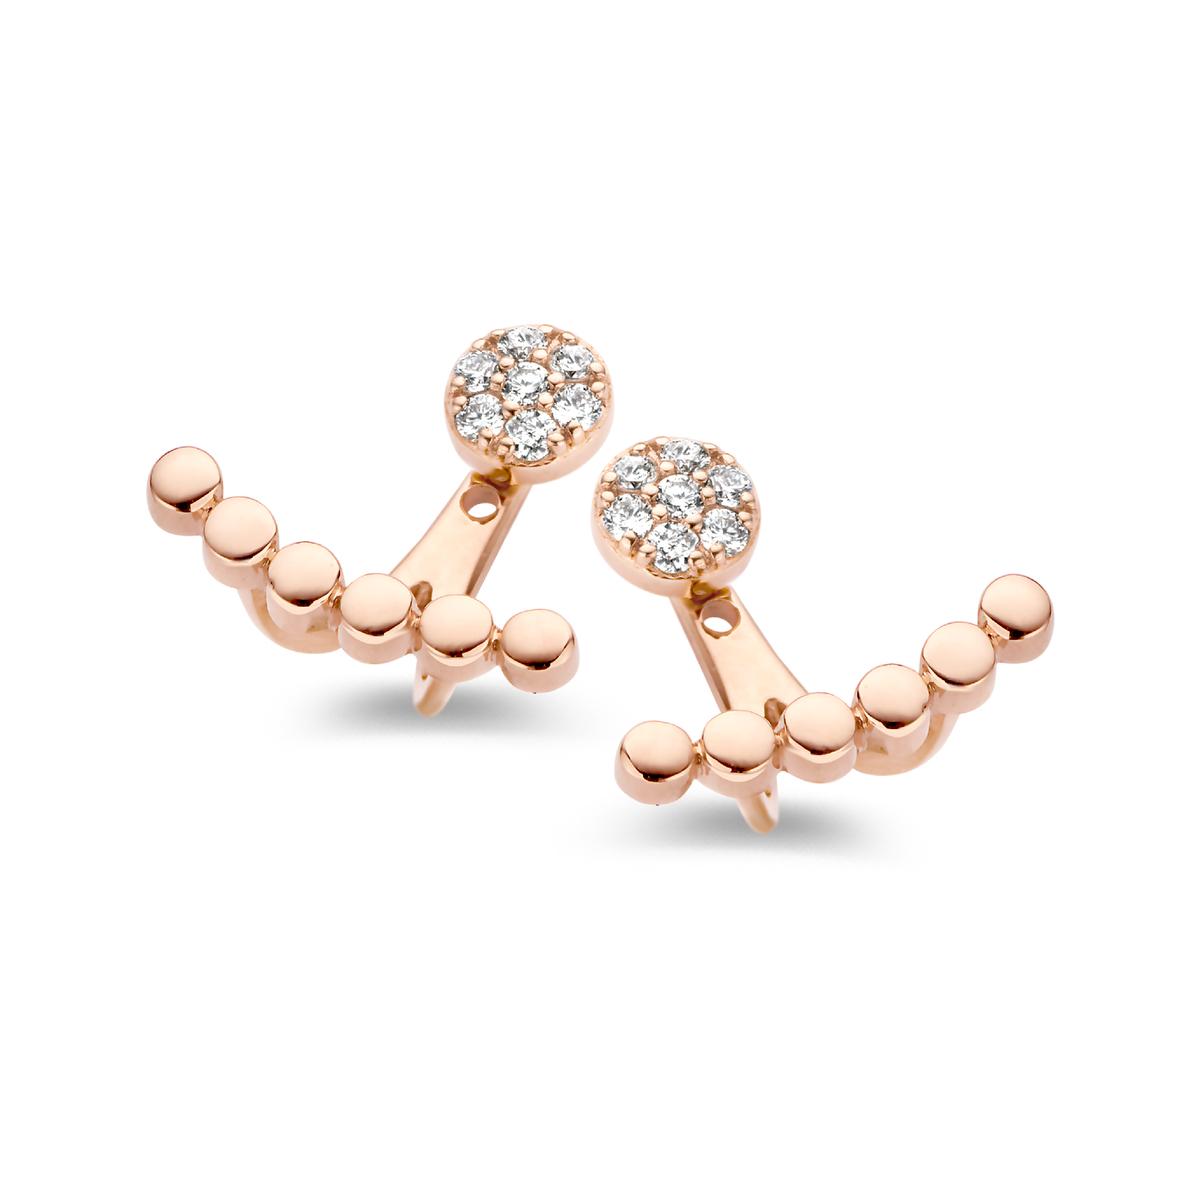 ischia earrings in rose gold